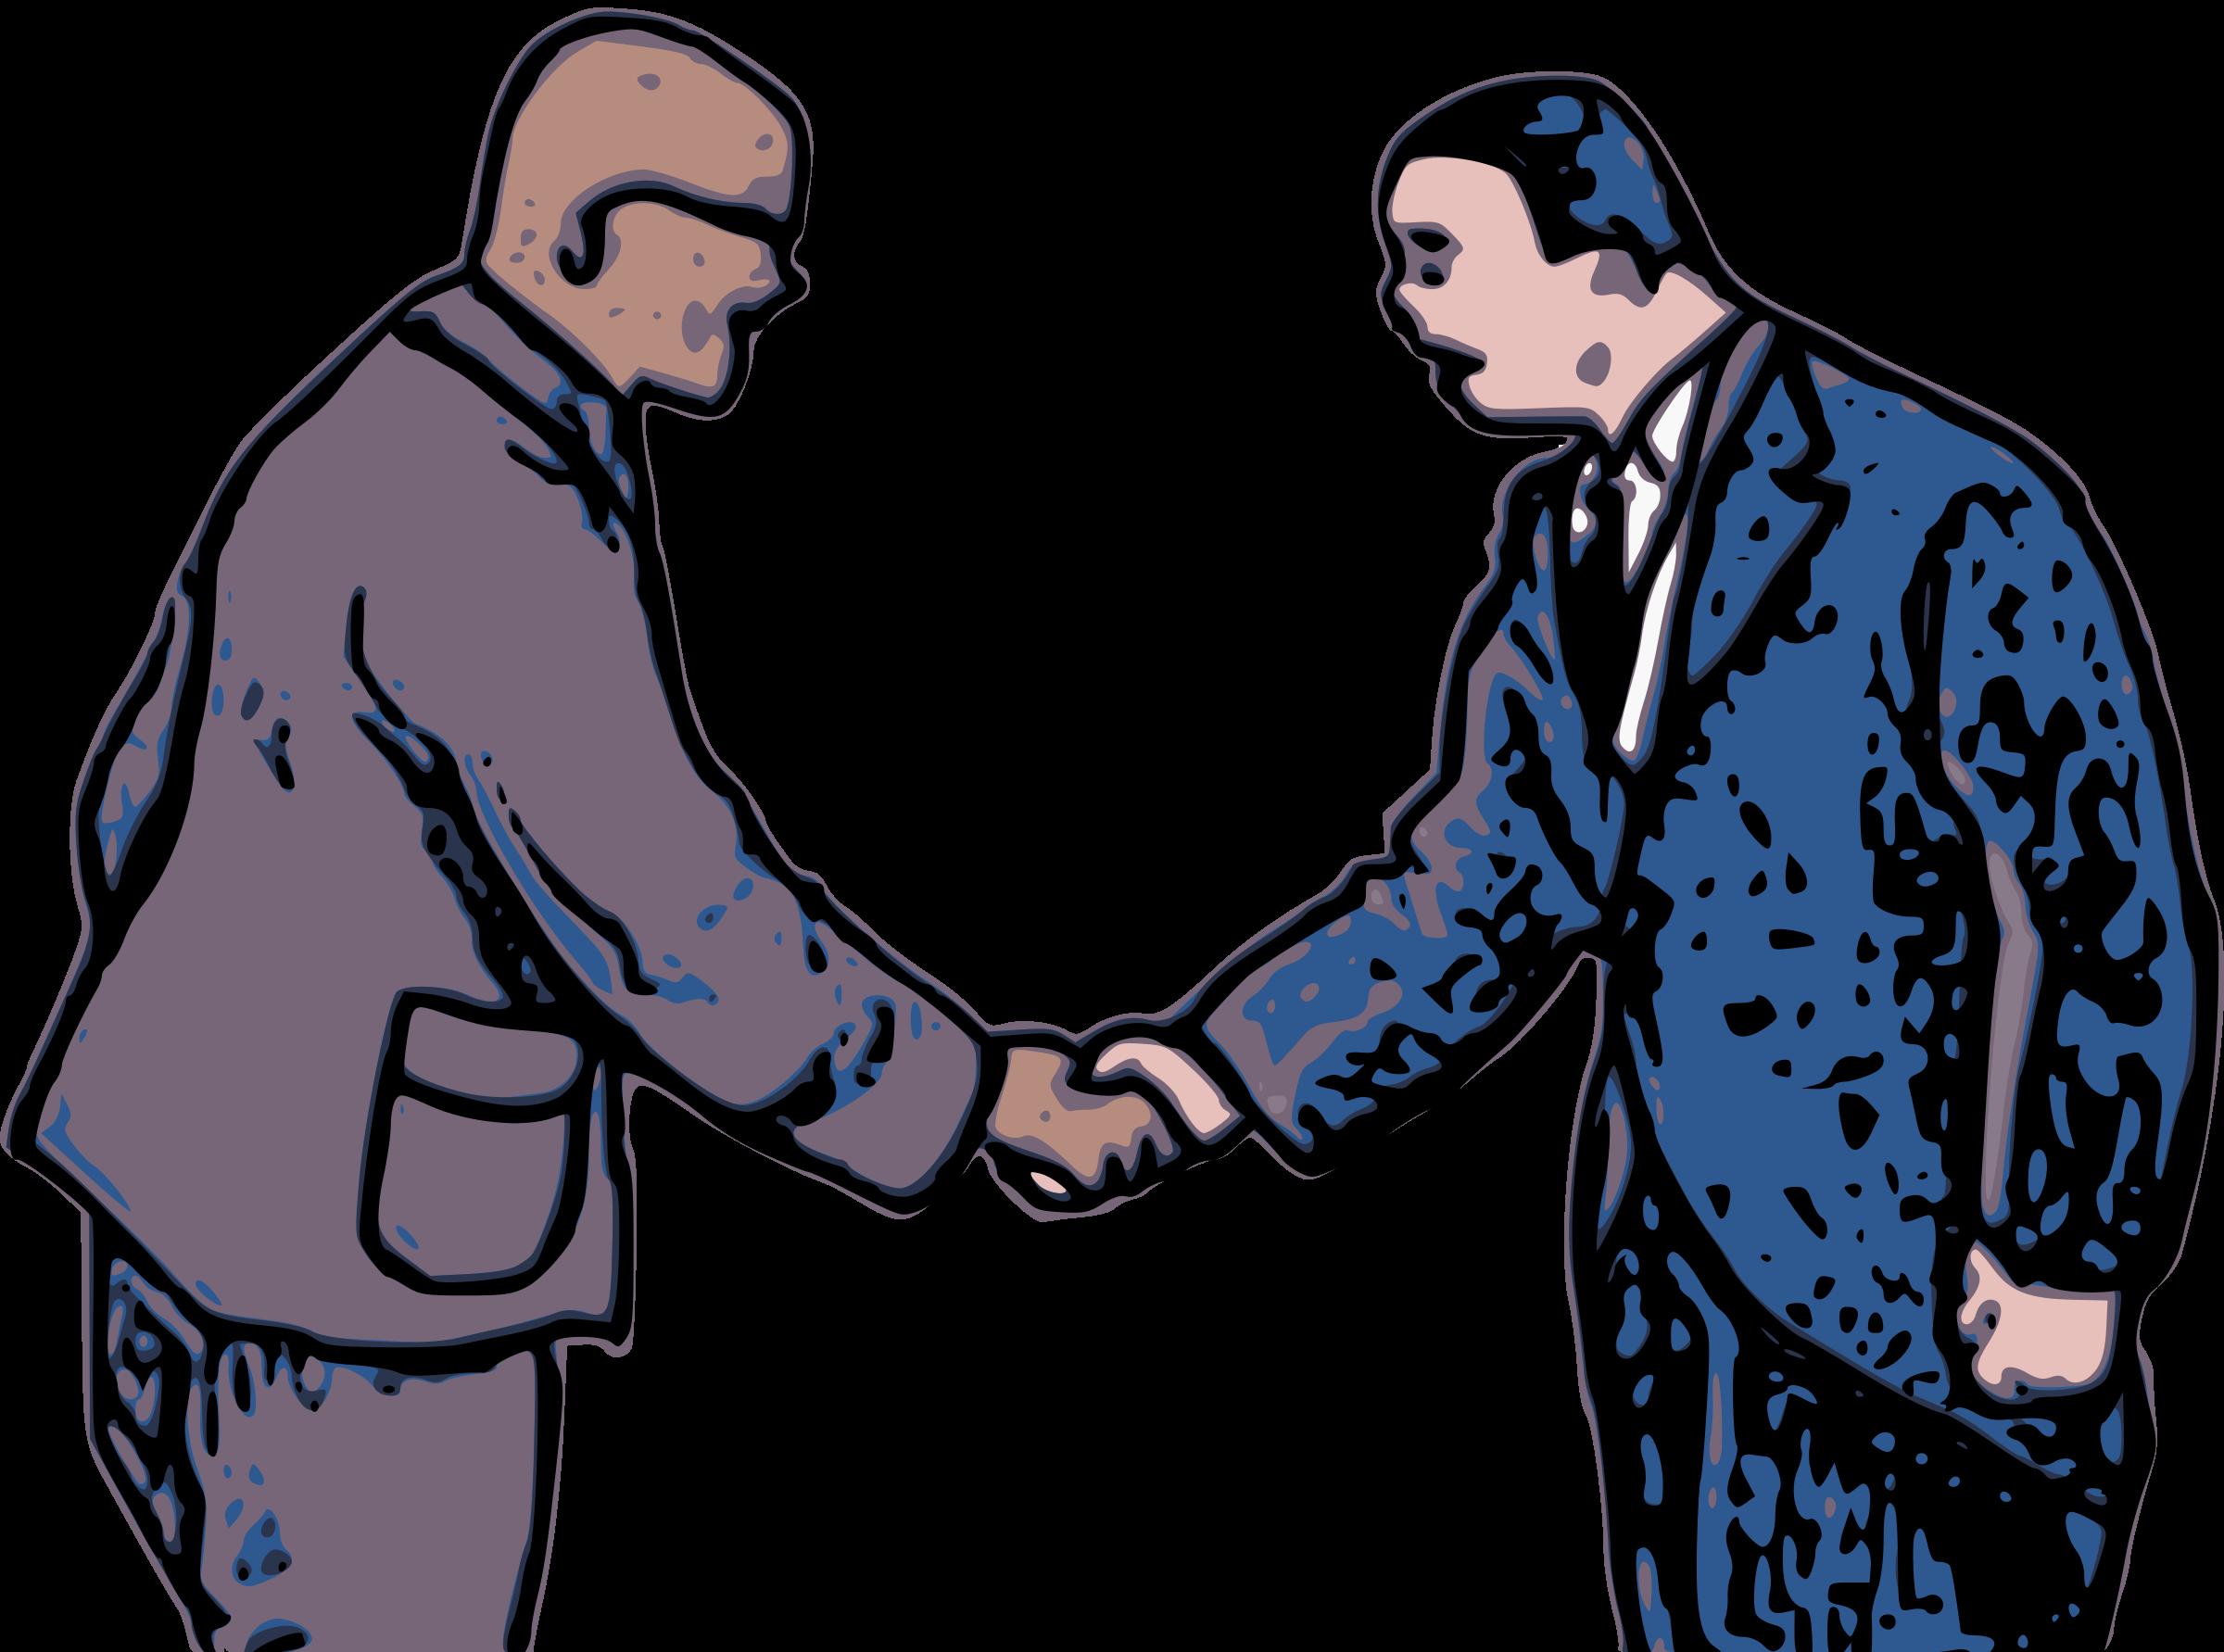 Handshake clipart two. Shake hands big image